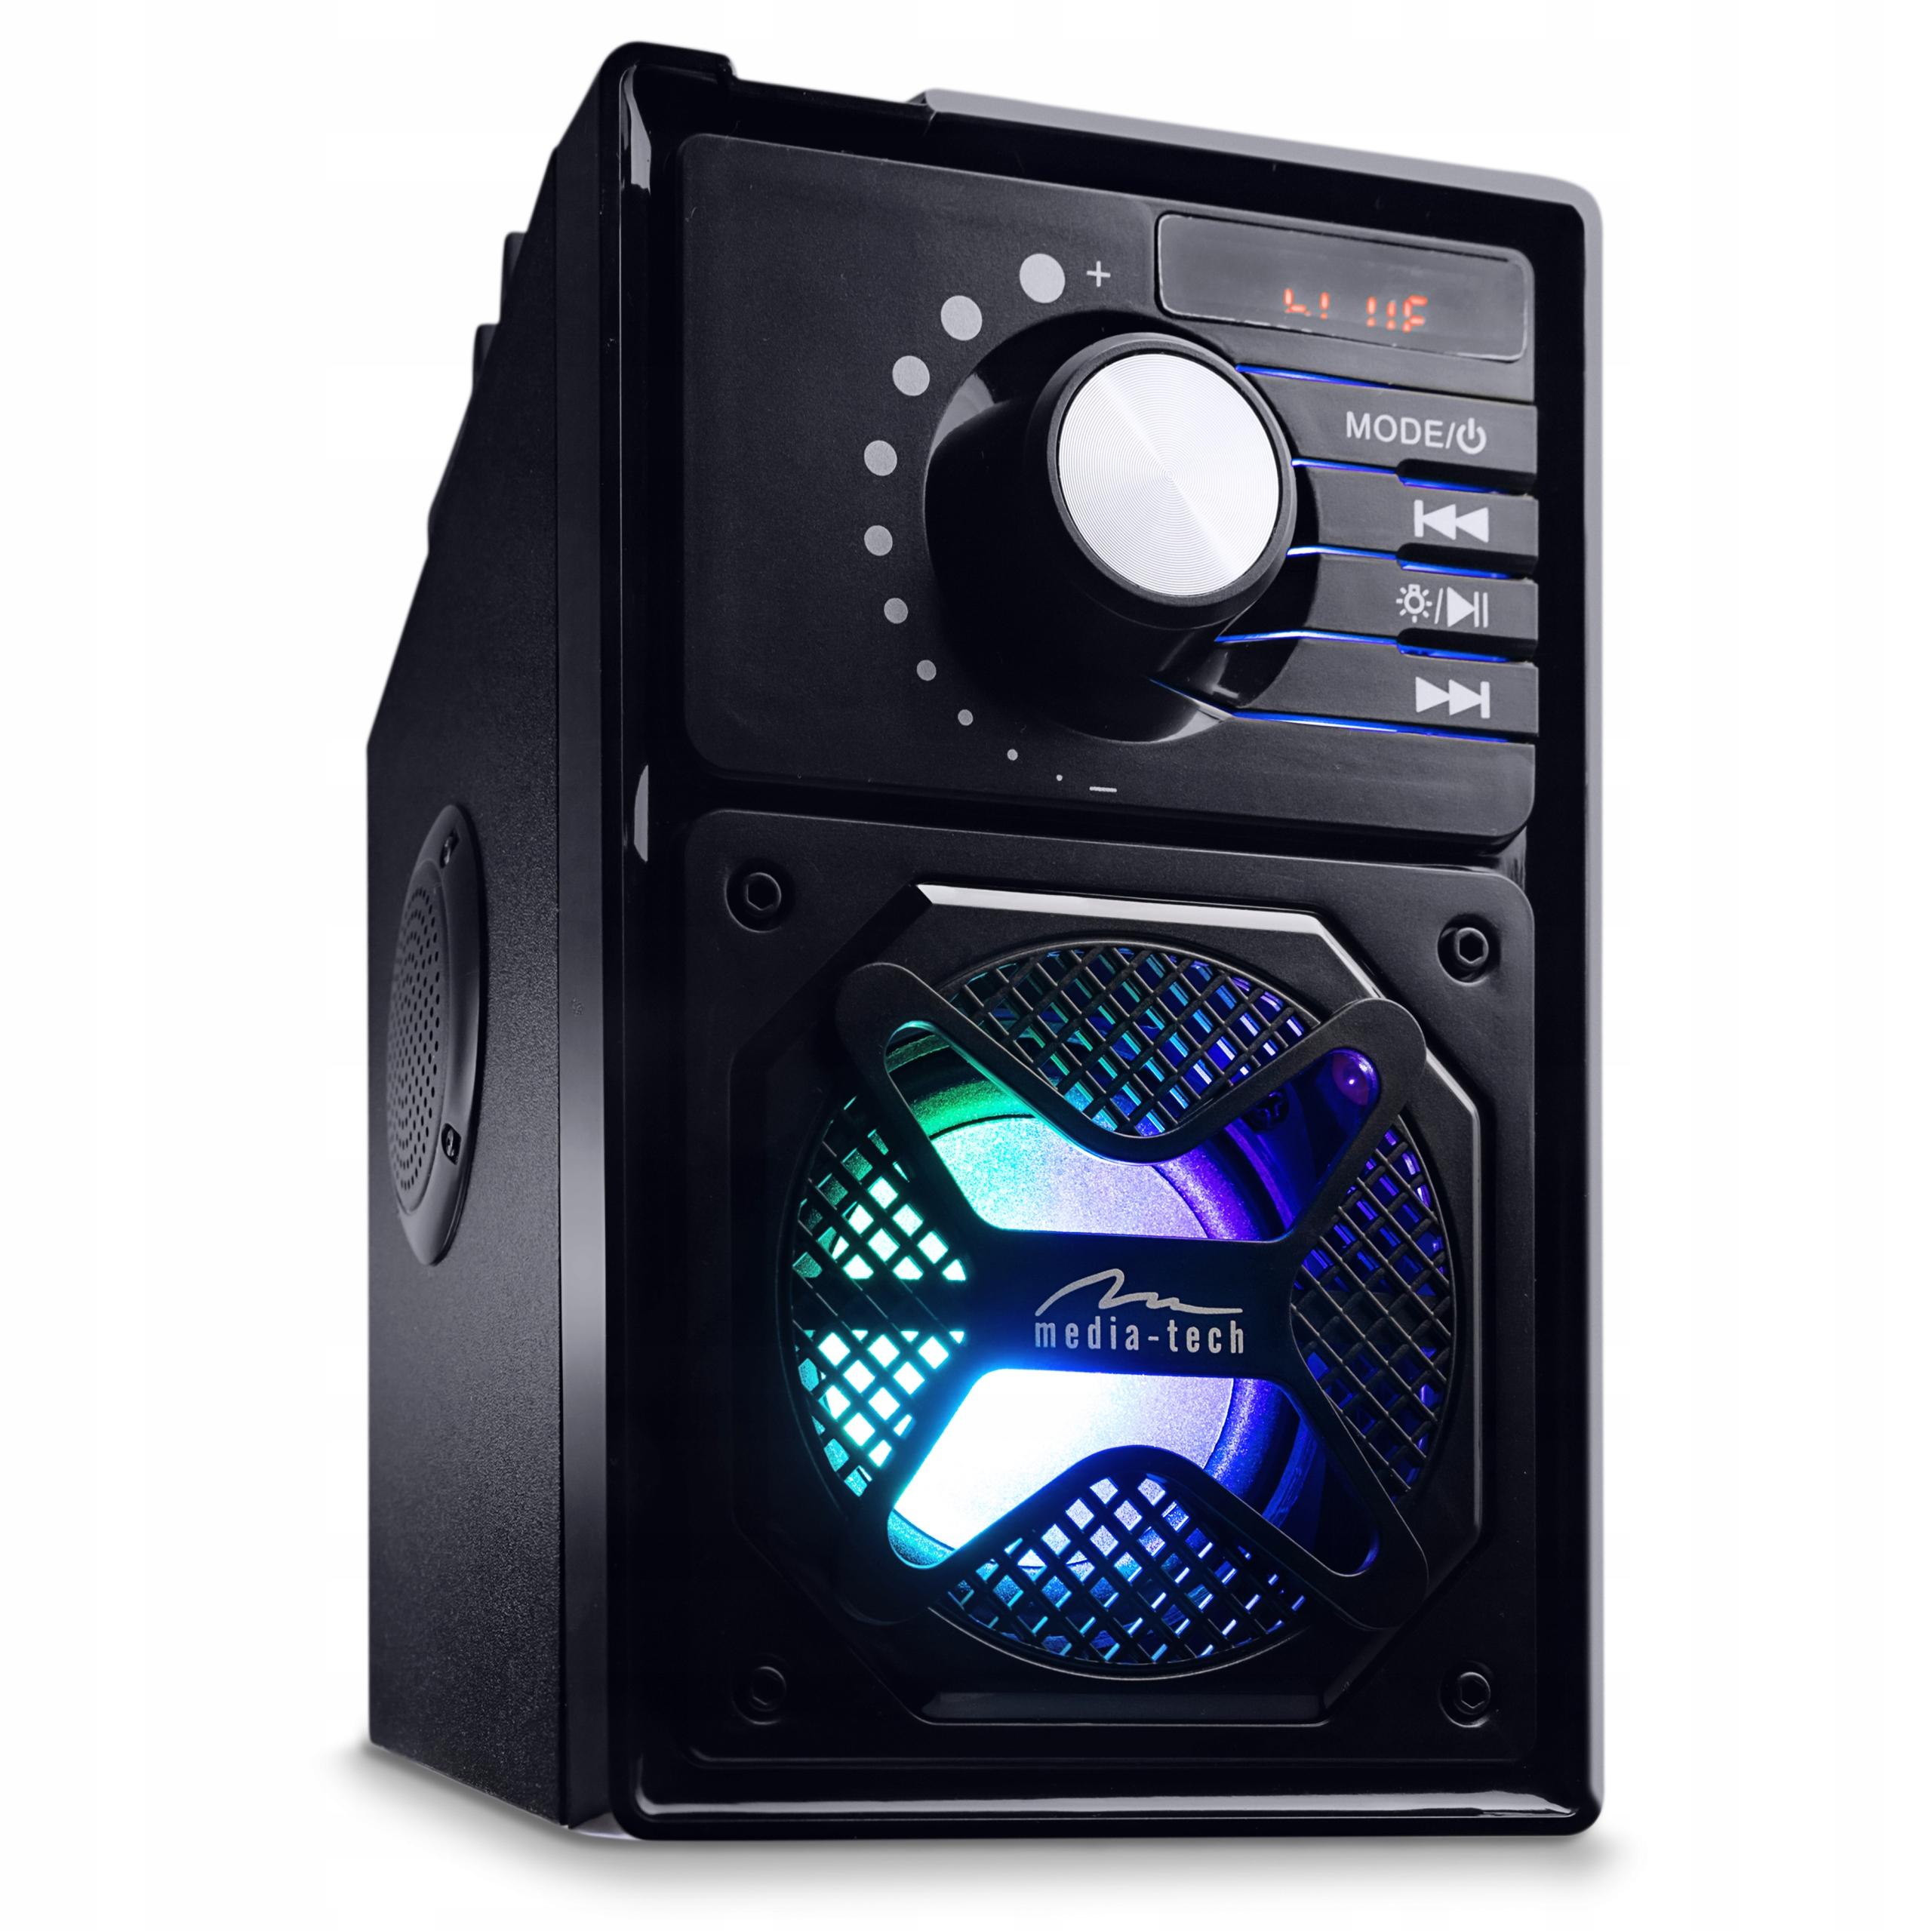 BEZDRÁTOVÝ PREHRÁVAČ MP3 BOOMBOX COLUMN 600 W